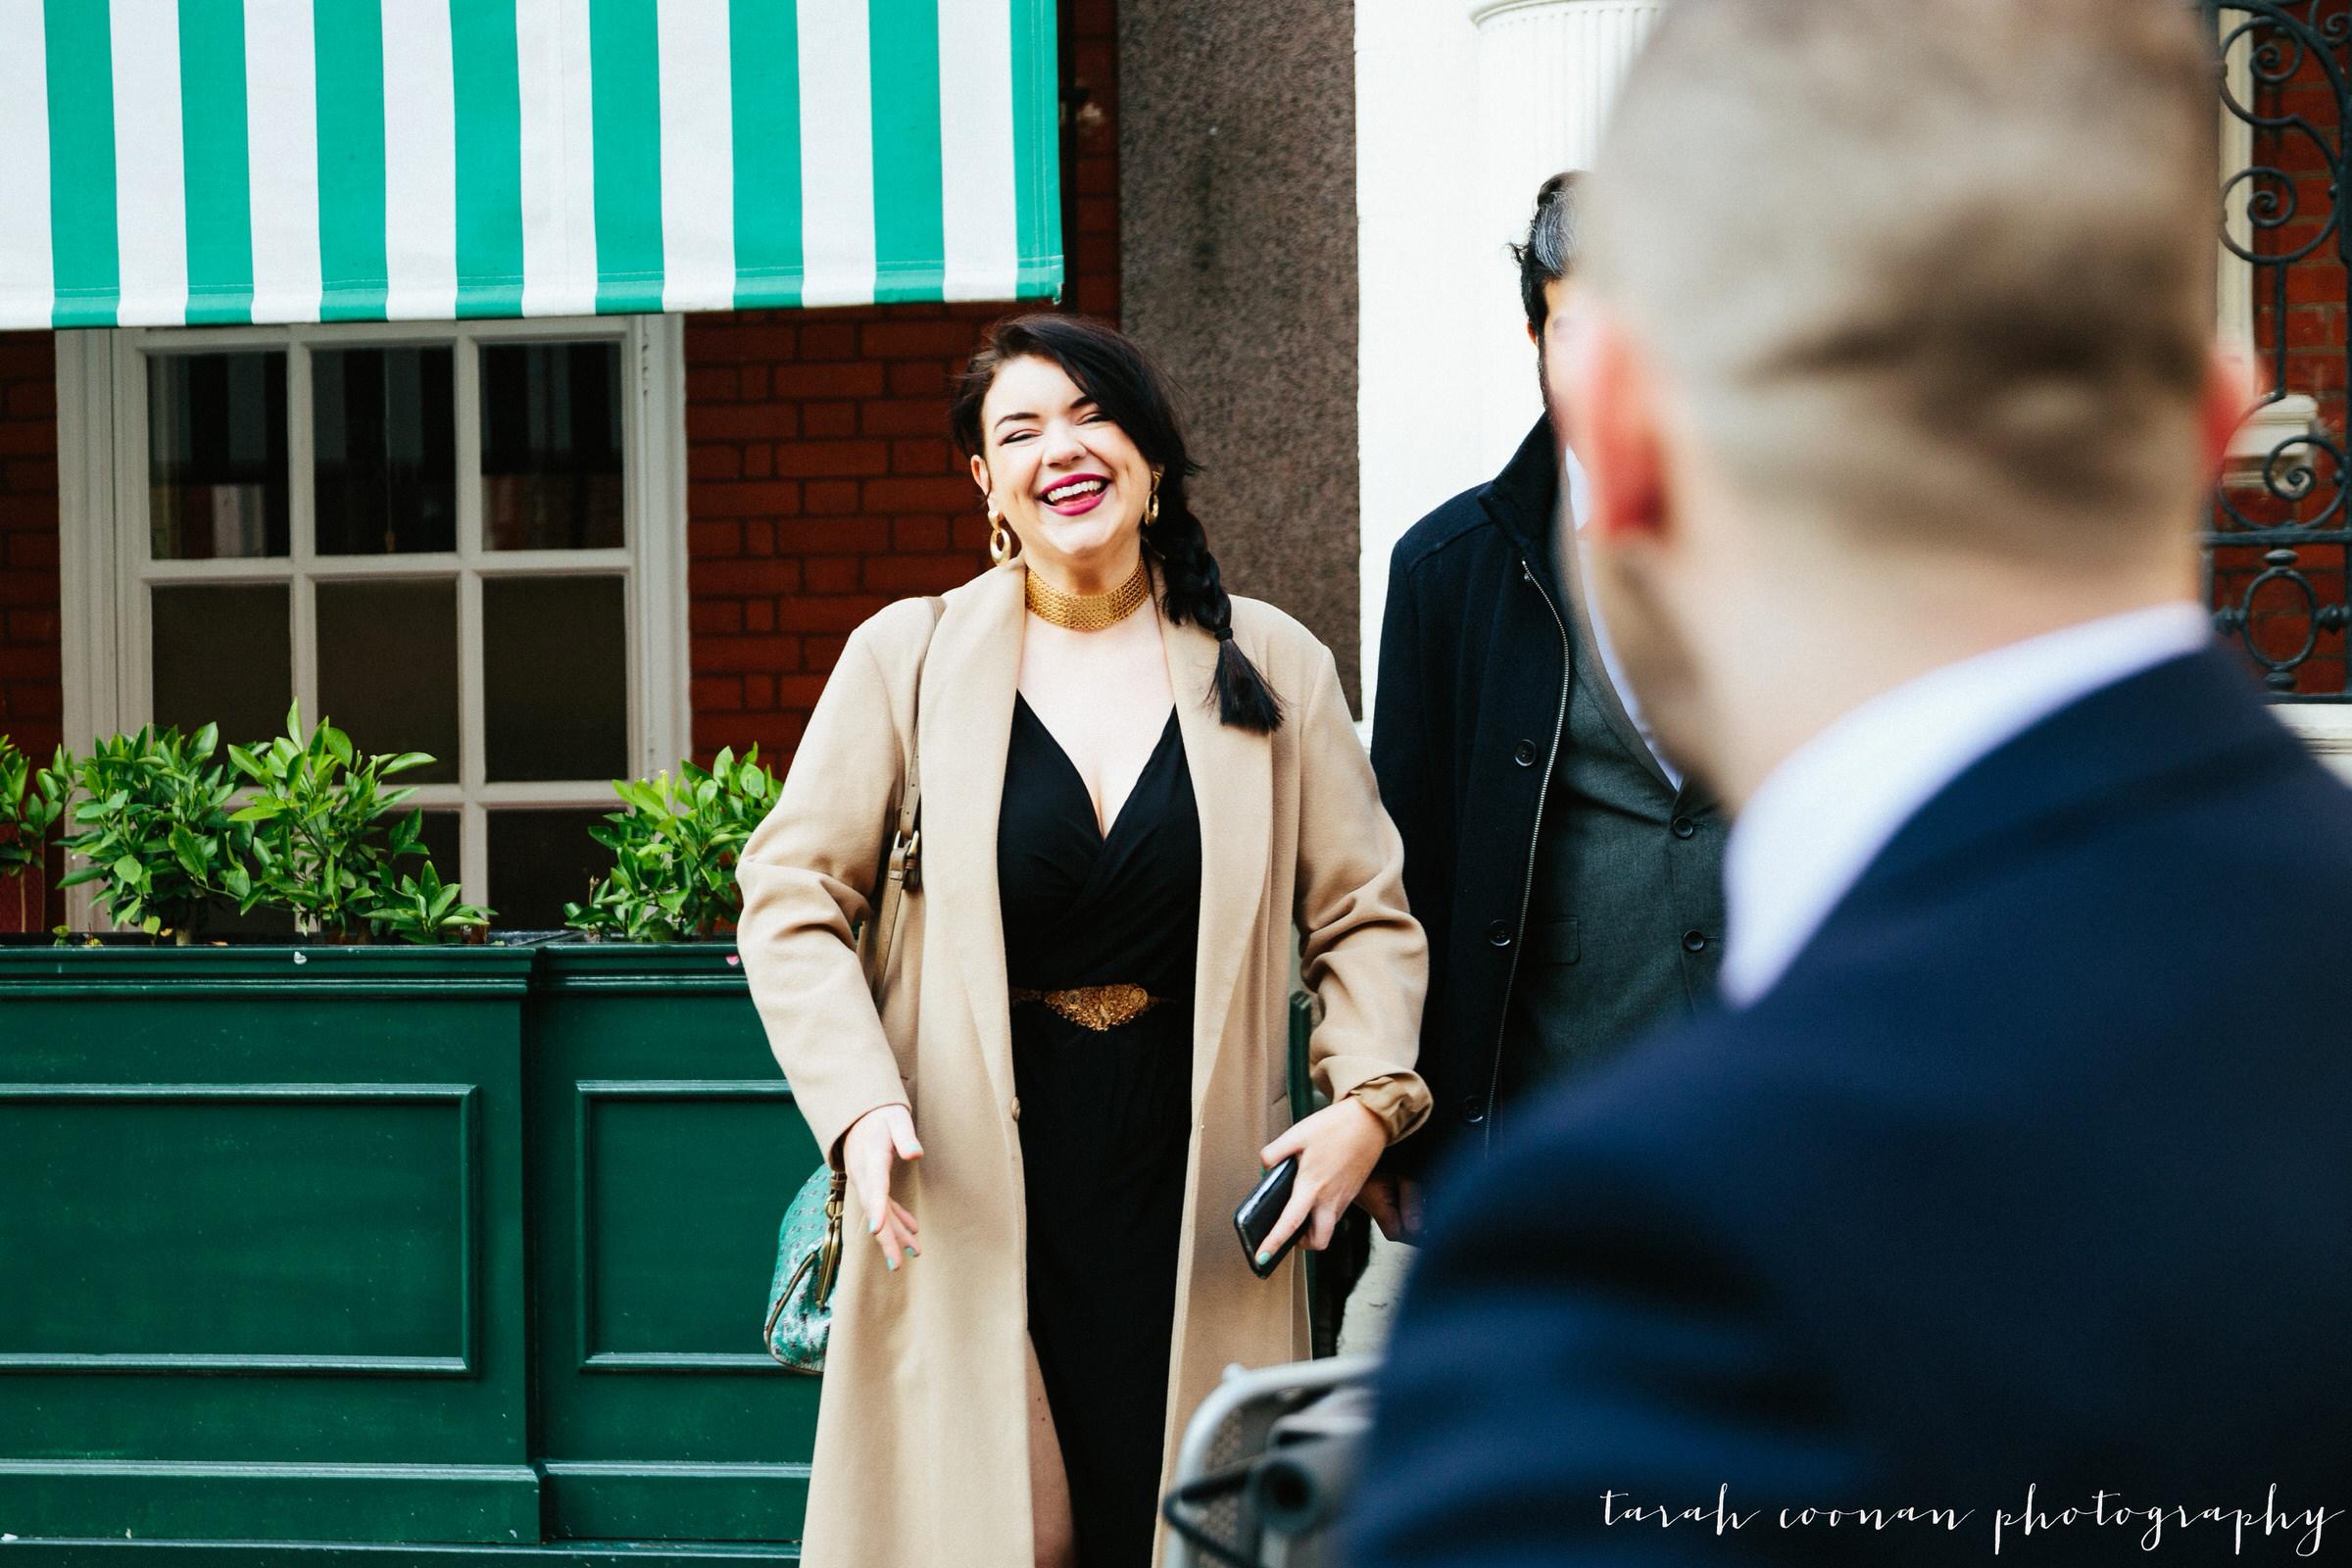 Mayfair Library wedding - Jo & Stephen